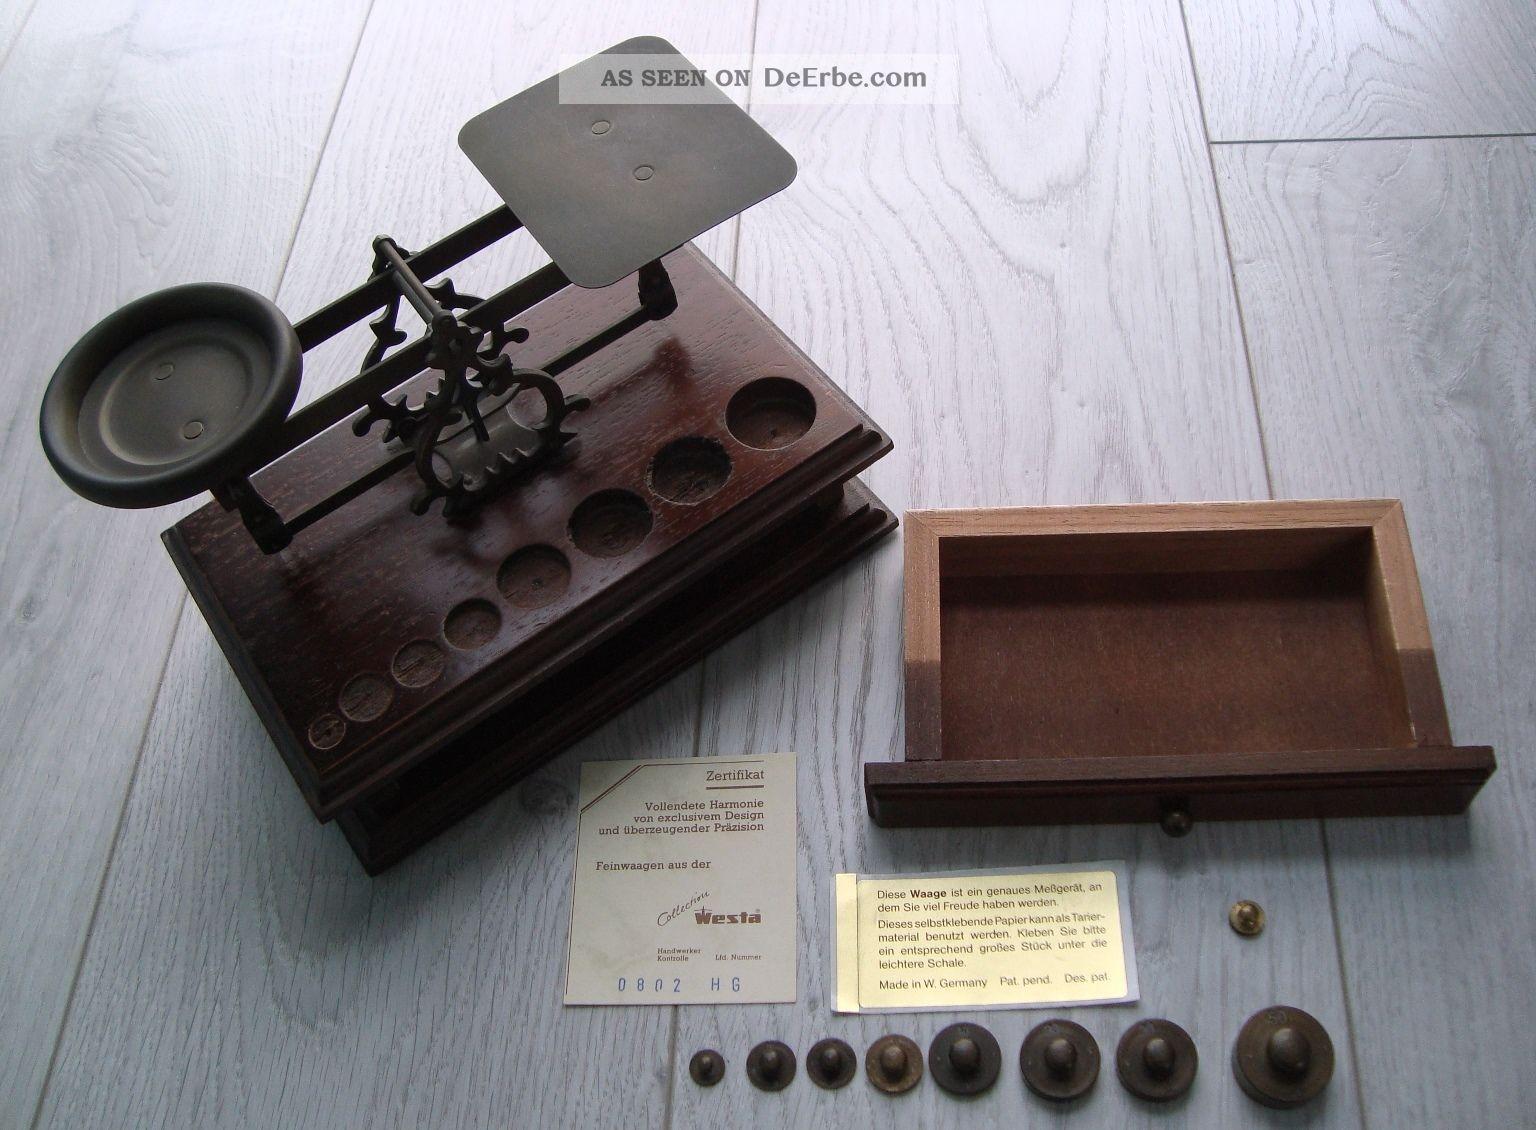 Feinwaage Briefwaage Apothekerwaage Westawaage Gewichte Holz Messing Zertifikat Kaufleute & Krämer Bild